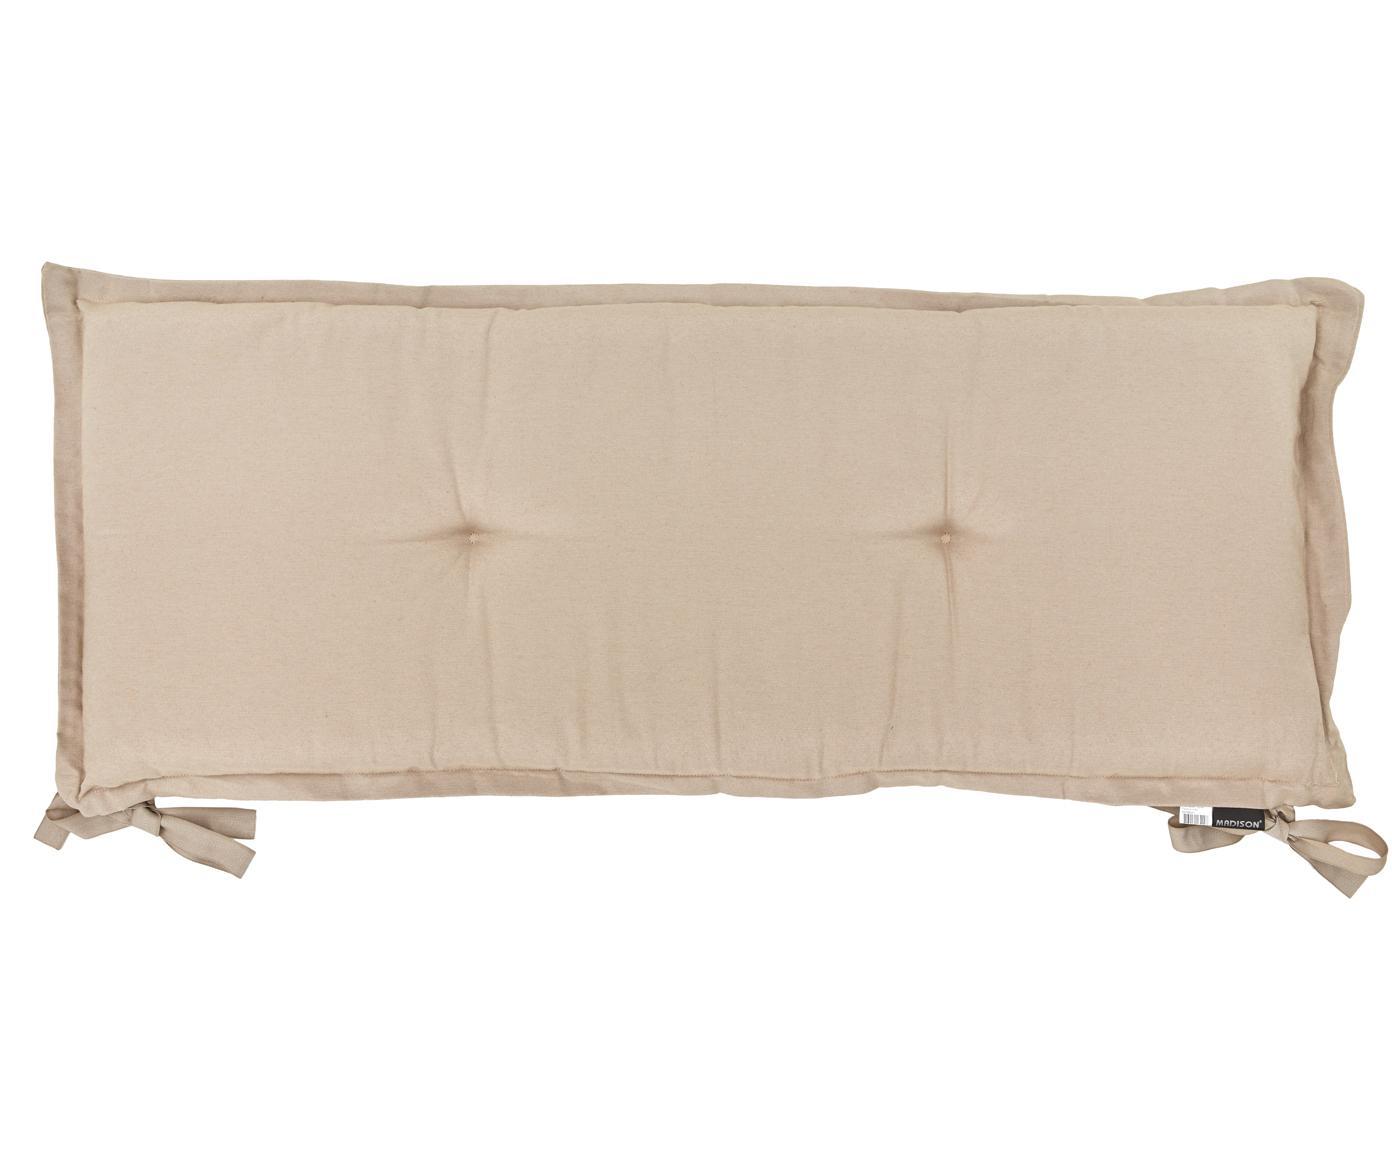 Cojín de banco Panama, Tapizado: 50%algodón, 45%poliéste, Arena, An 48 x L 120 cm